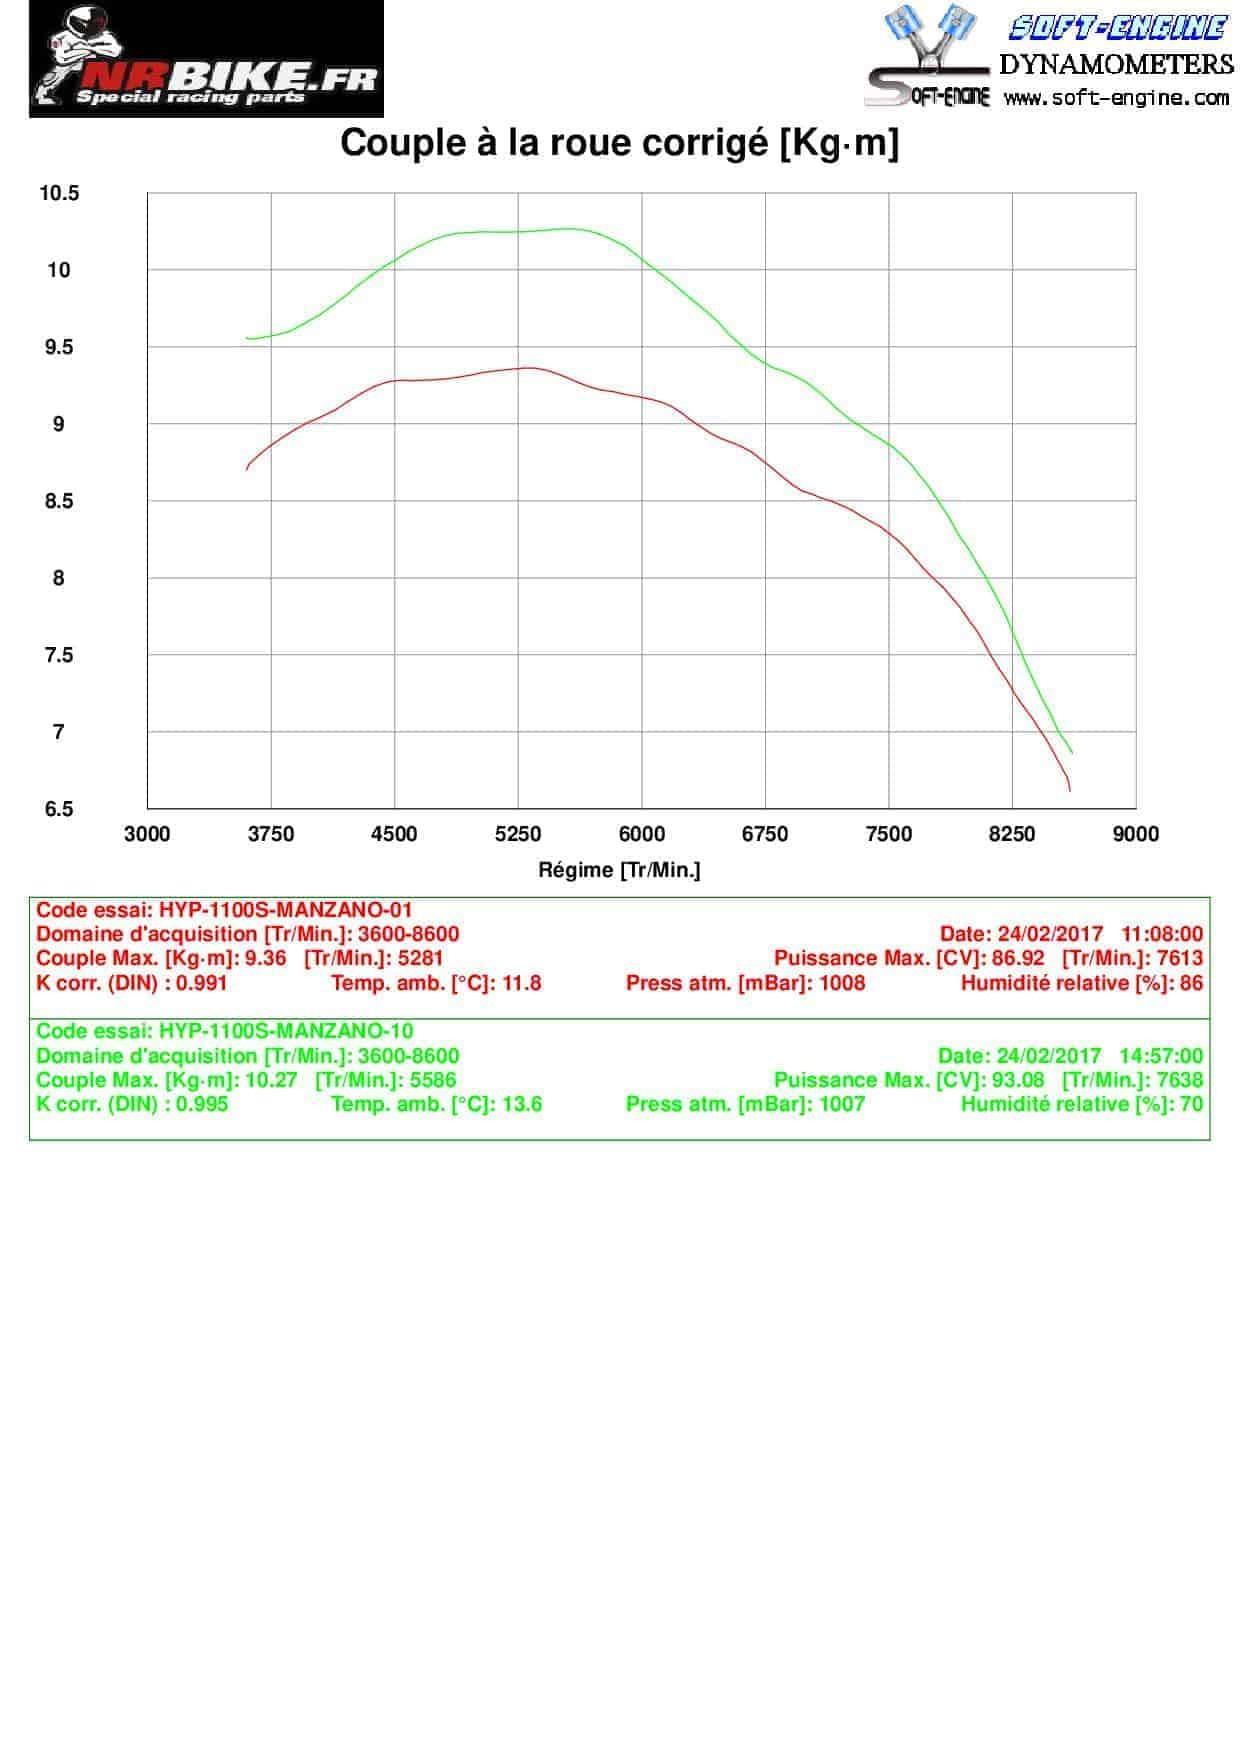 Reprogrammation ECU Ducati  HYPERMOTARD 1100 / S